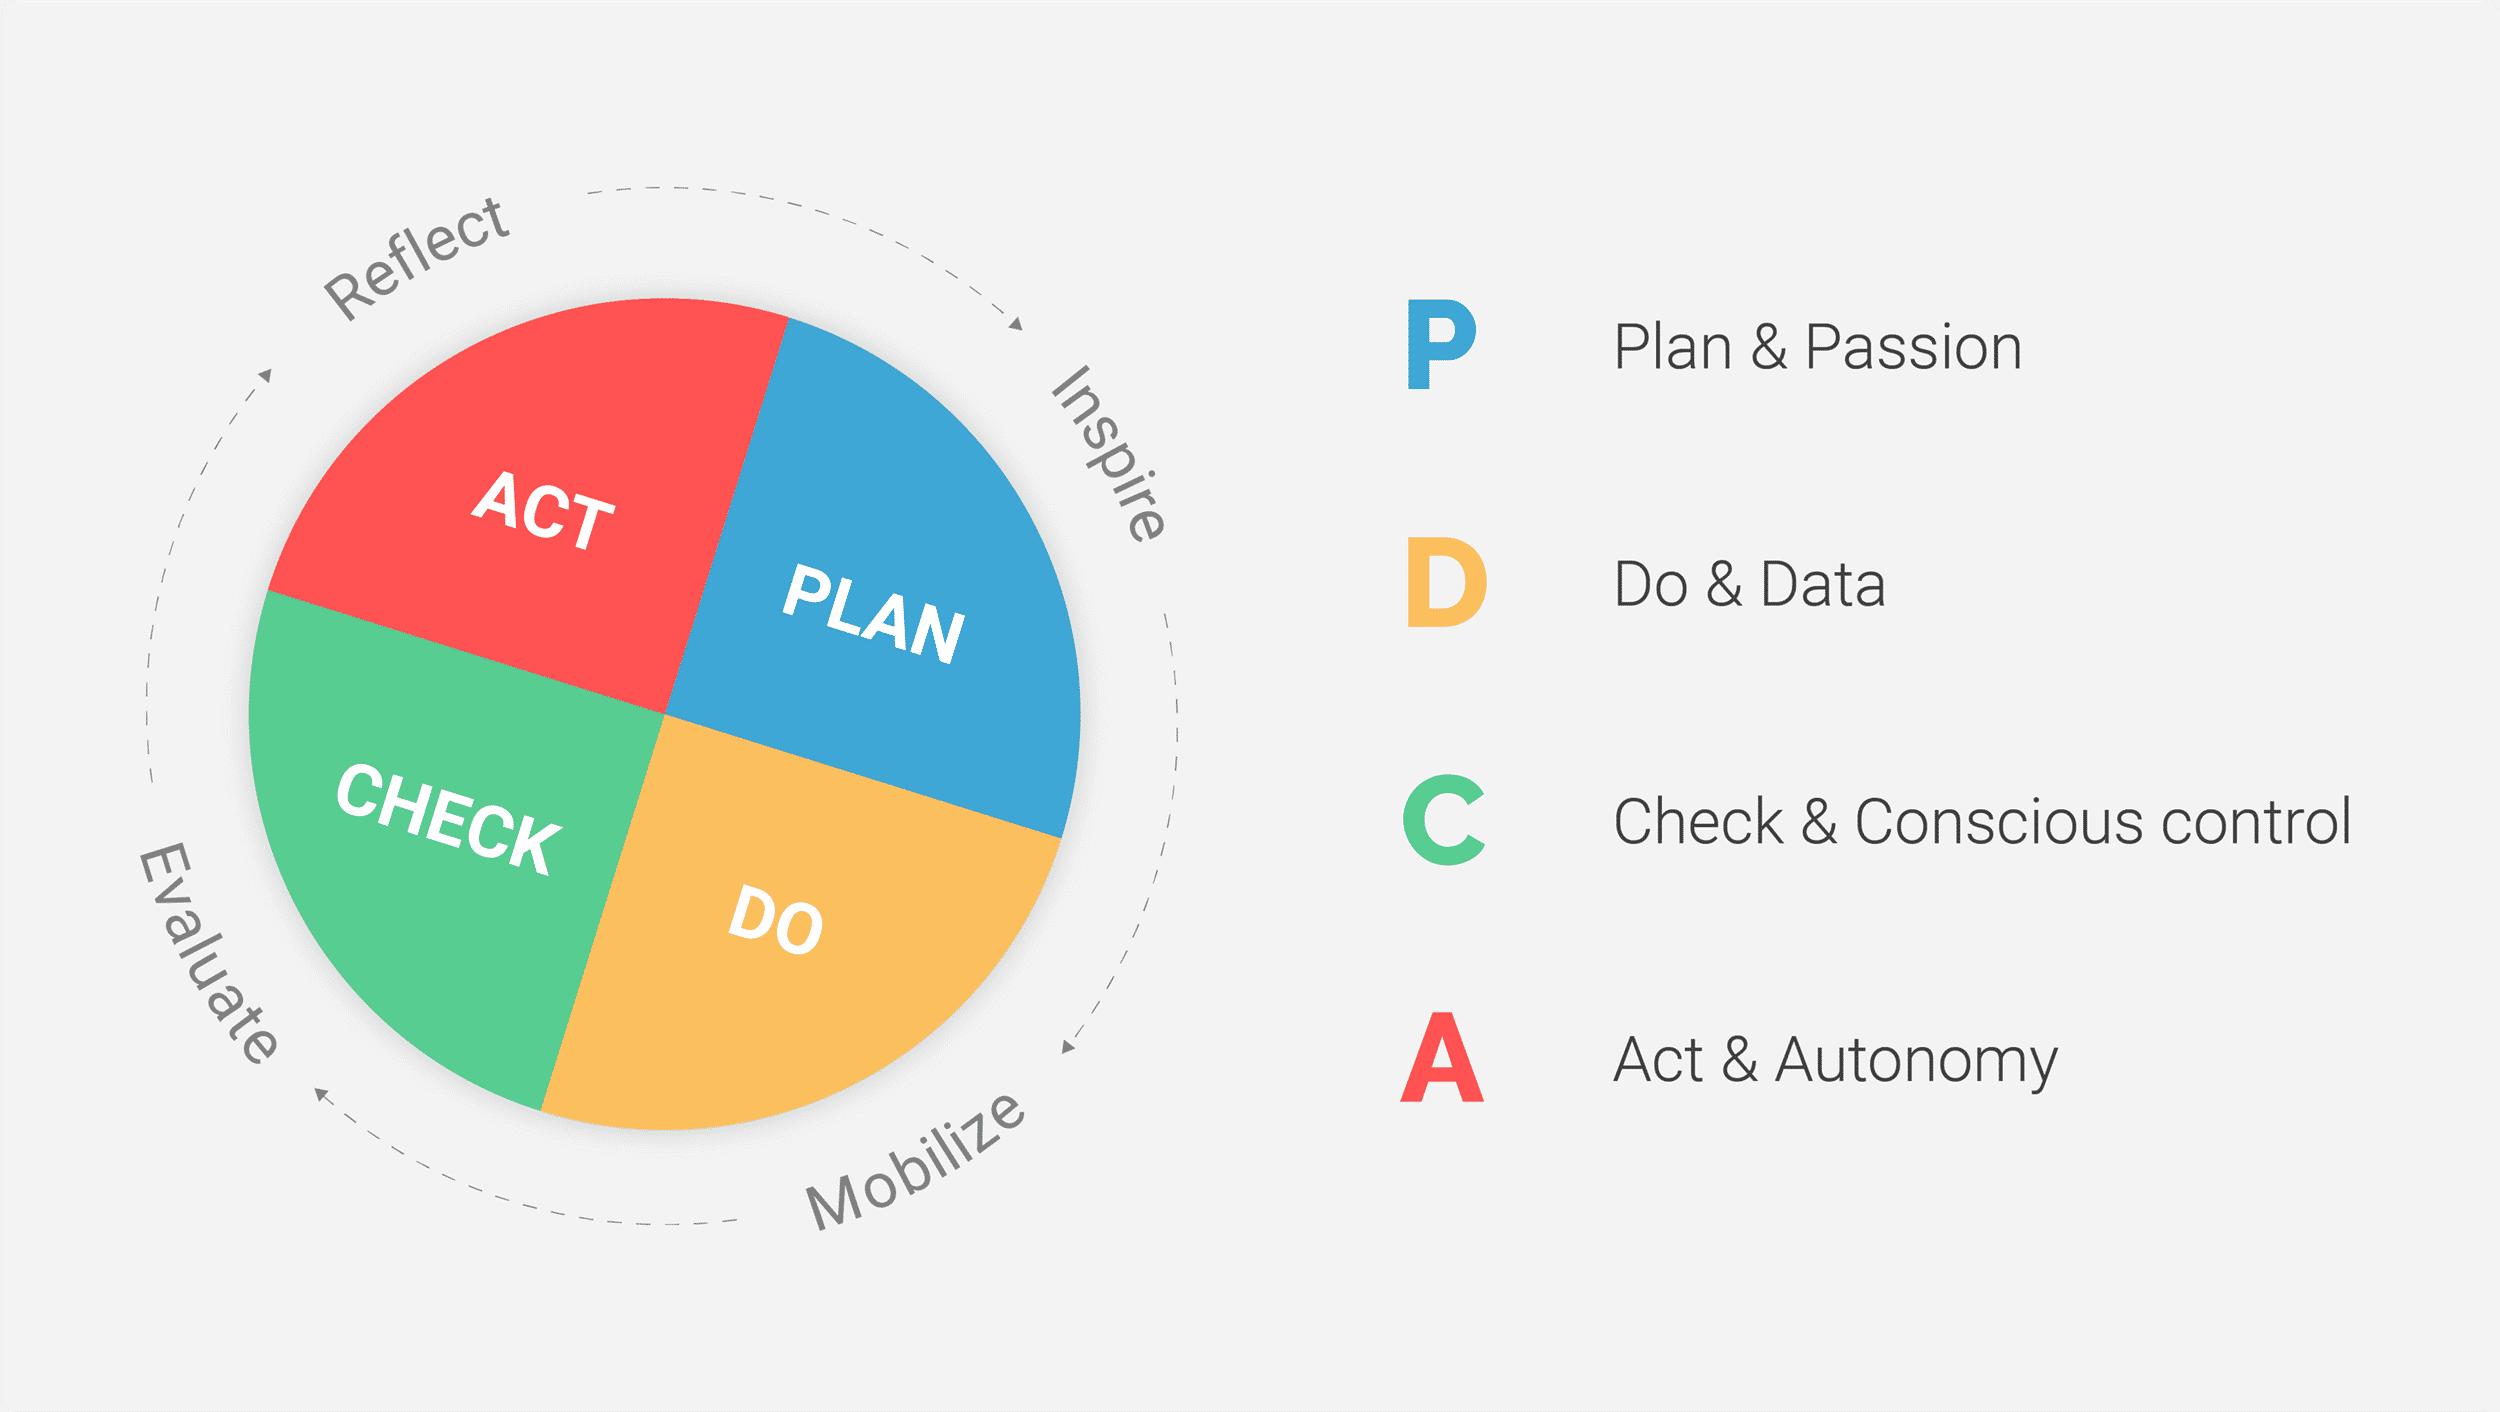 The datacratic PDCA